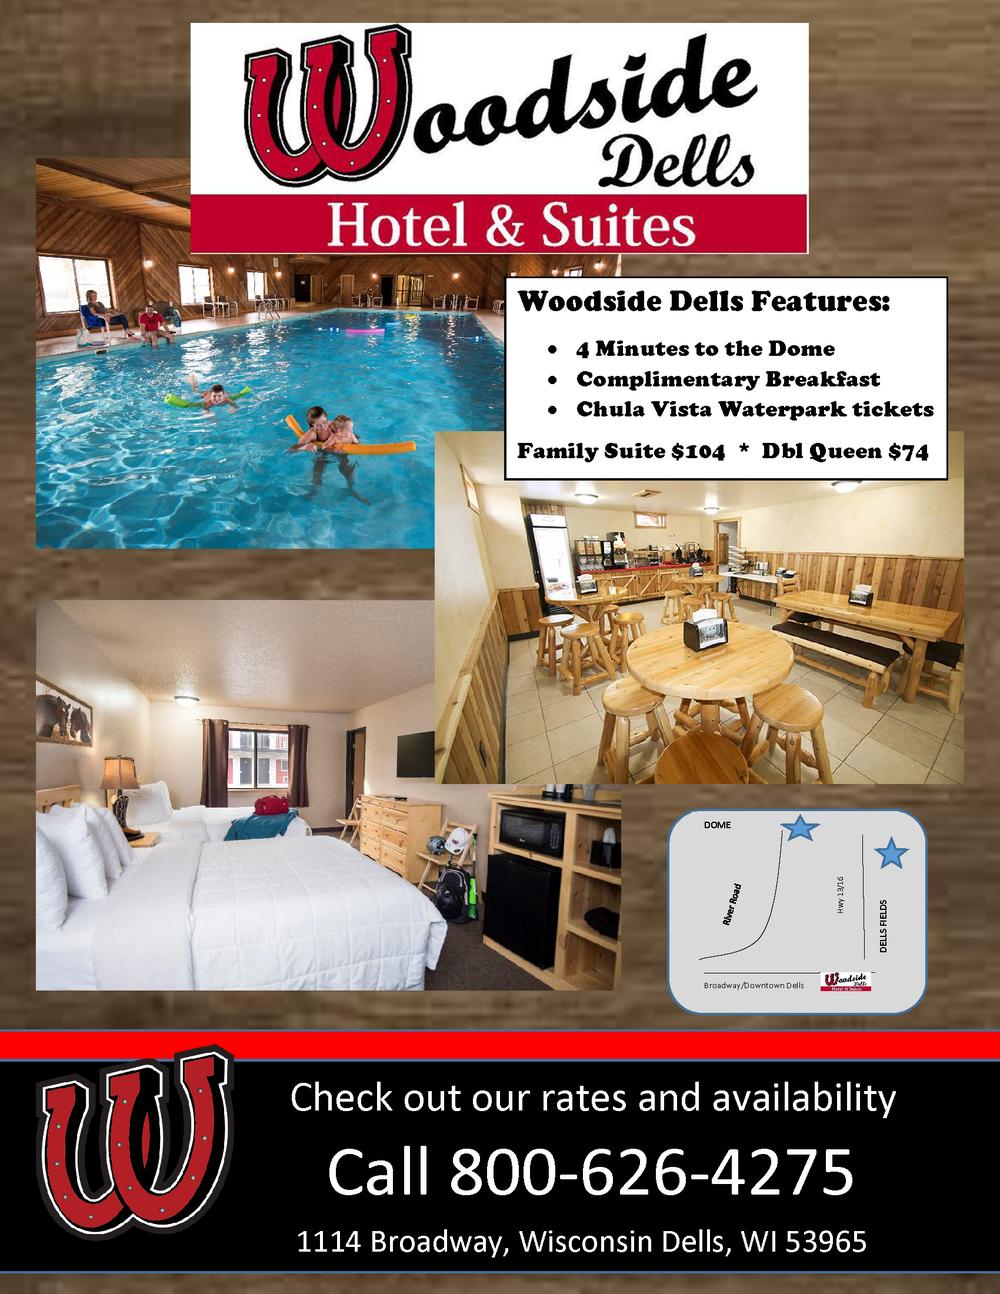 Dells hotel flyer.png